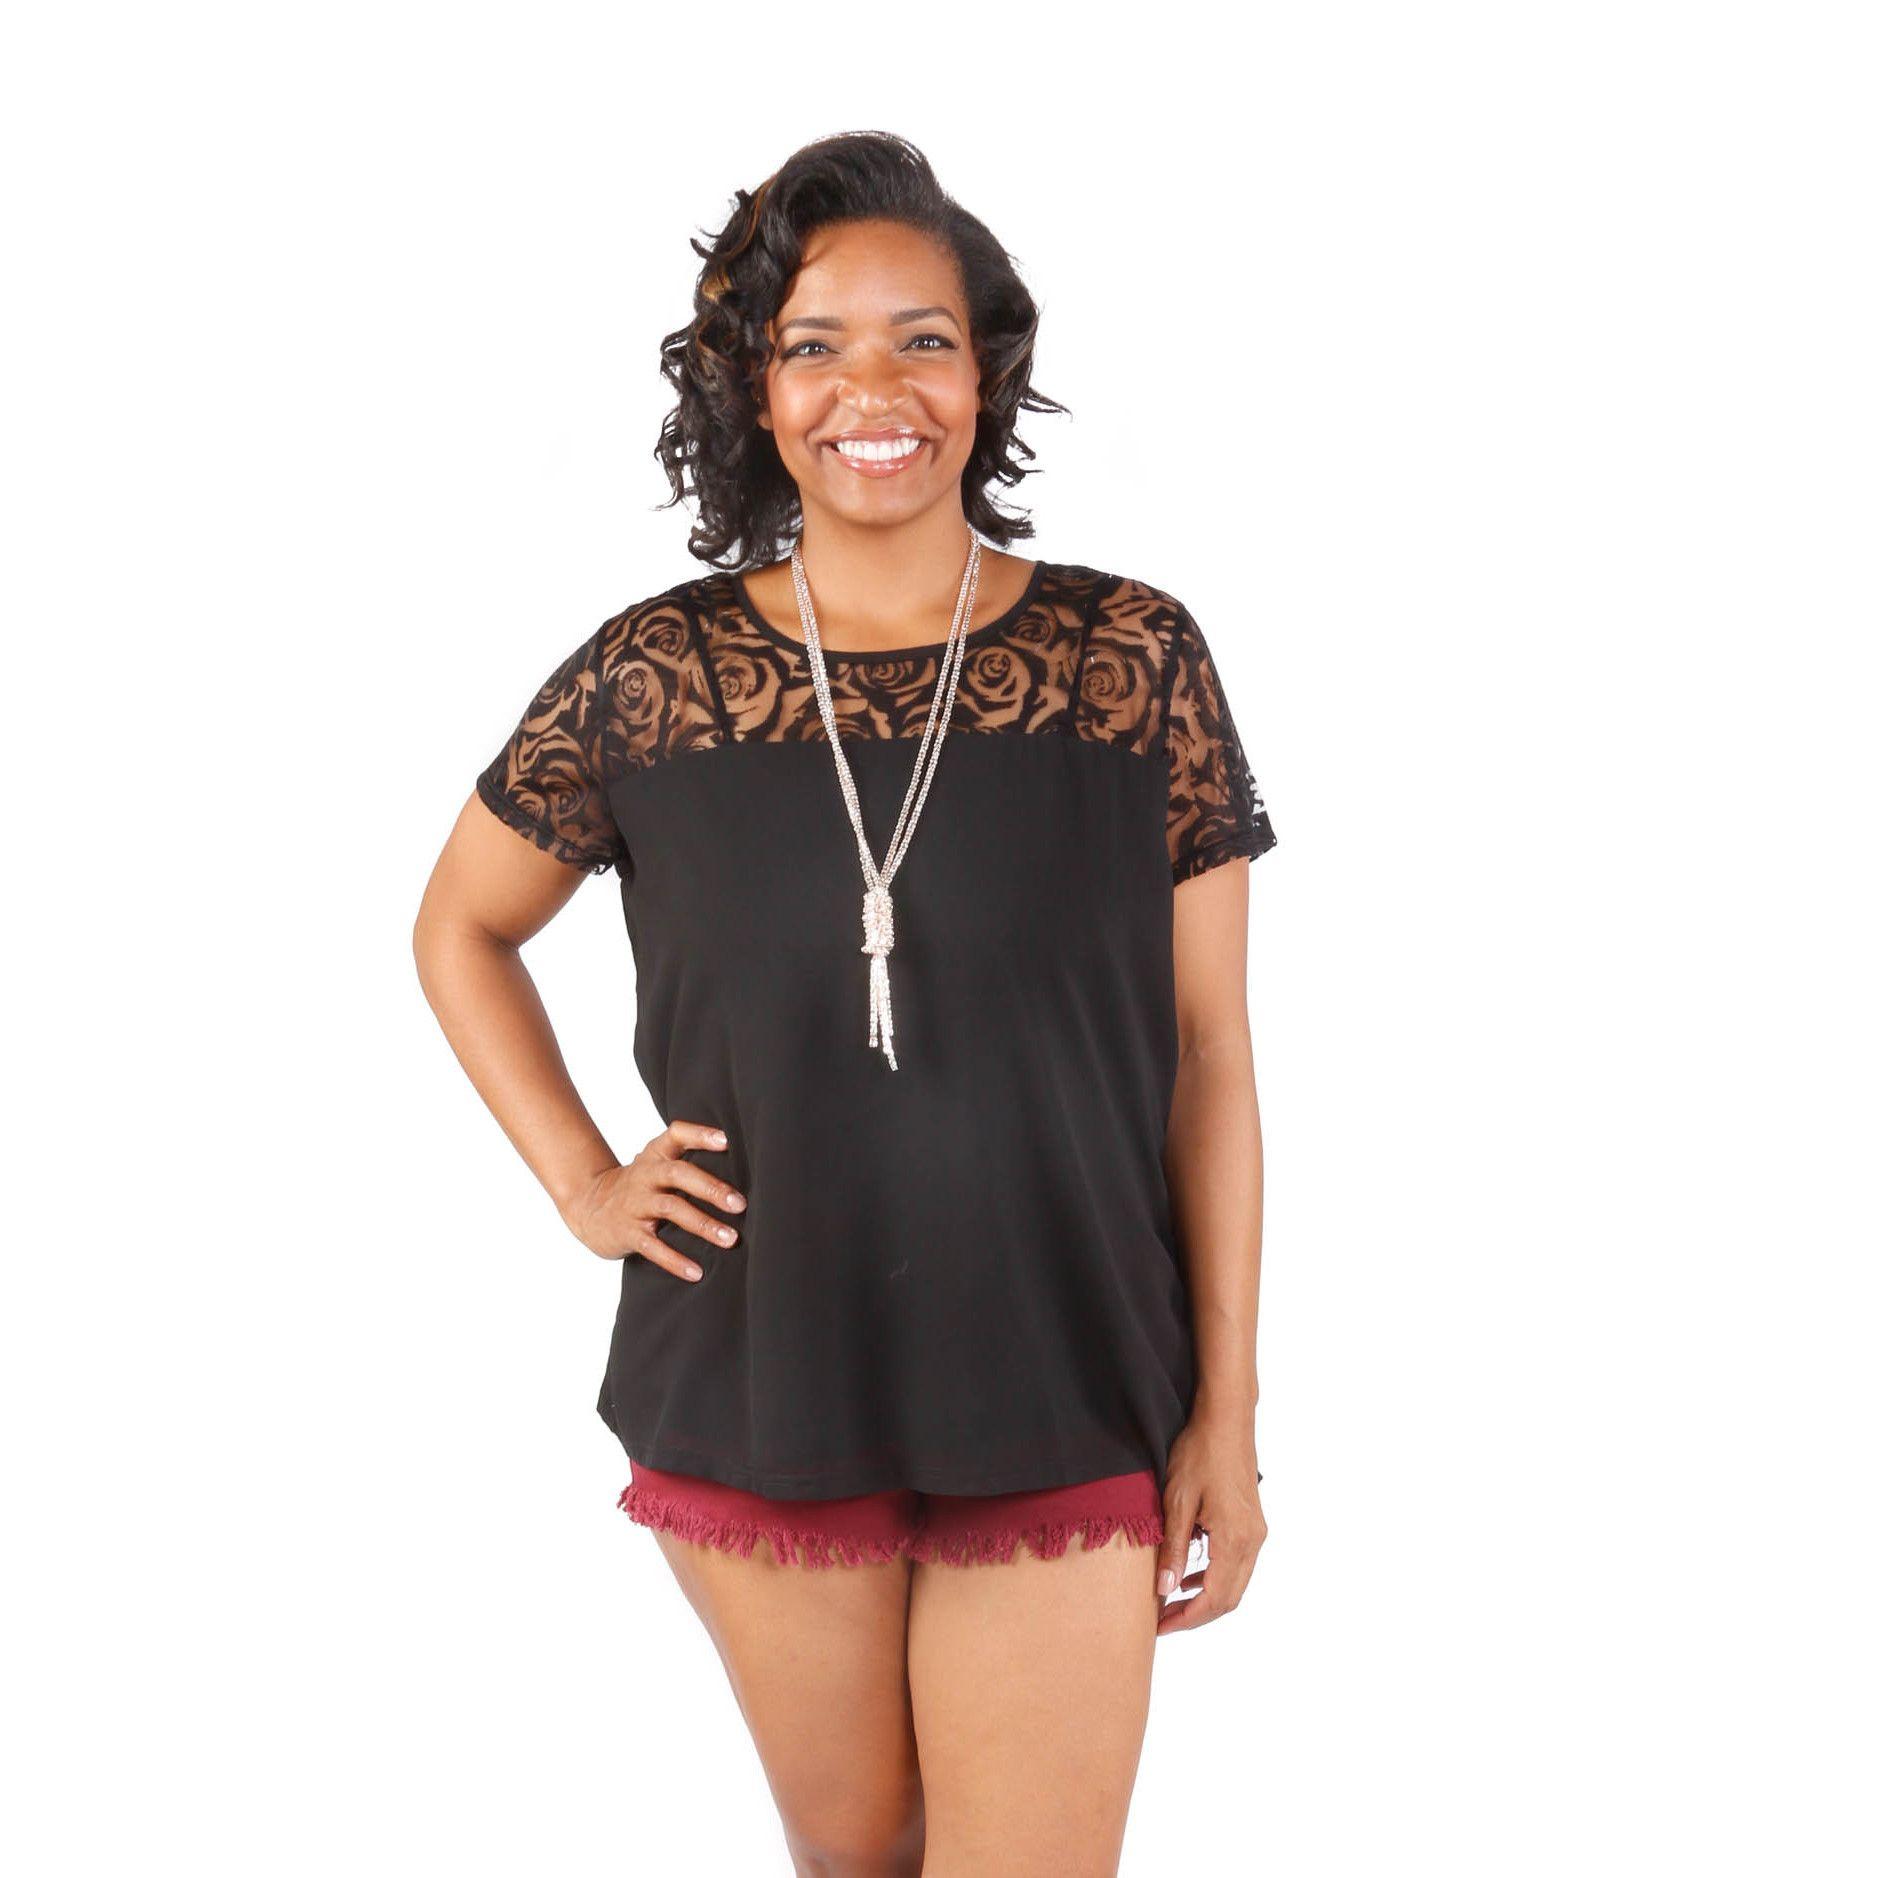 Hadari Women's Plus Size Short Sleeve Top